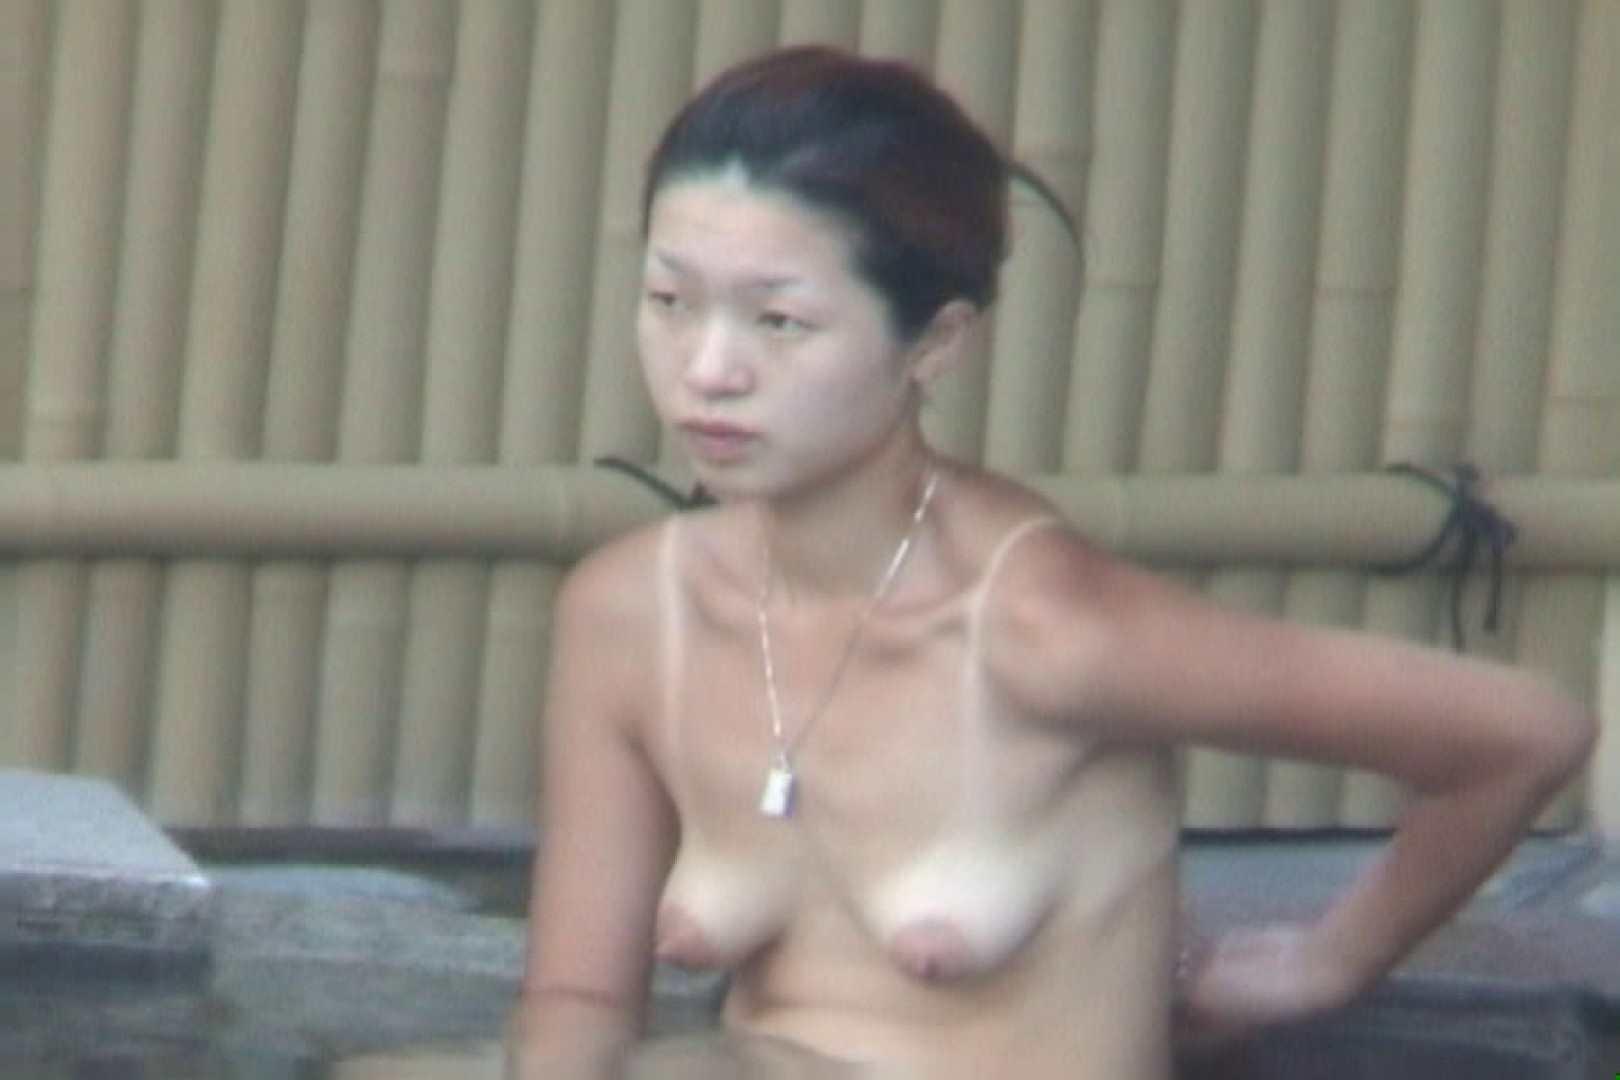 Aquaな露天風呂Vol.571 盗撮  81連発 54